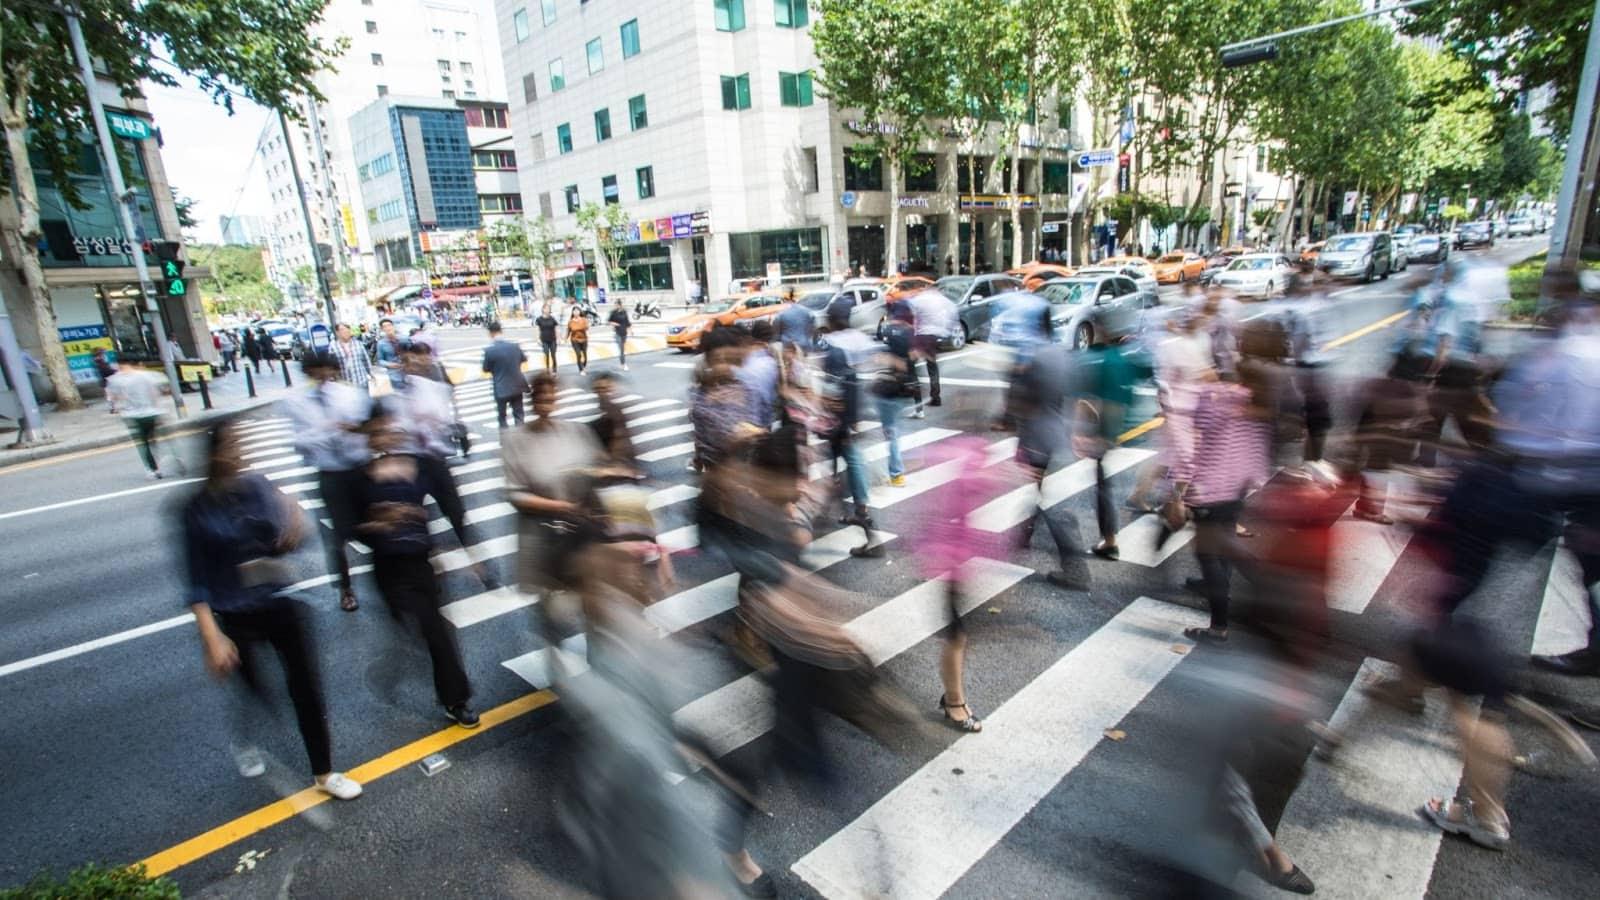 Pedestrian safety in South Korea